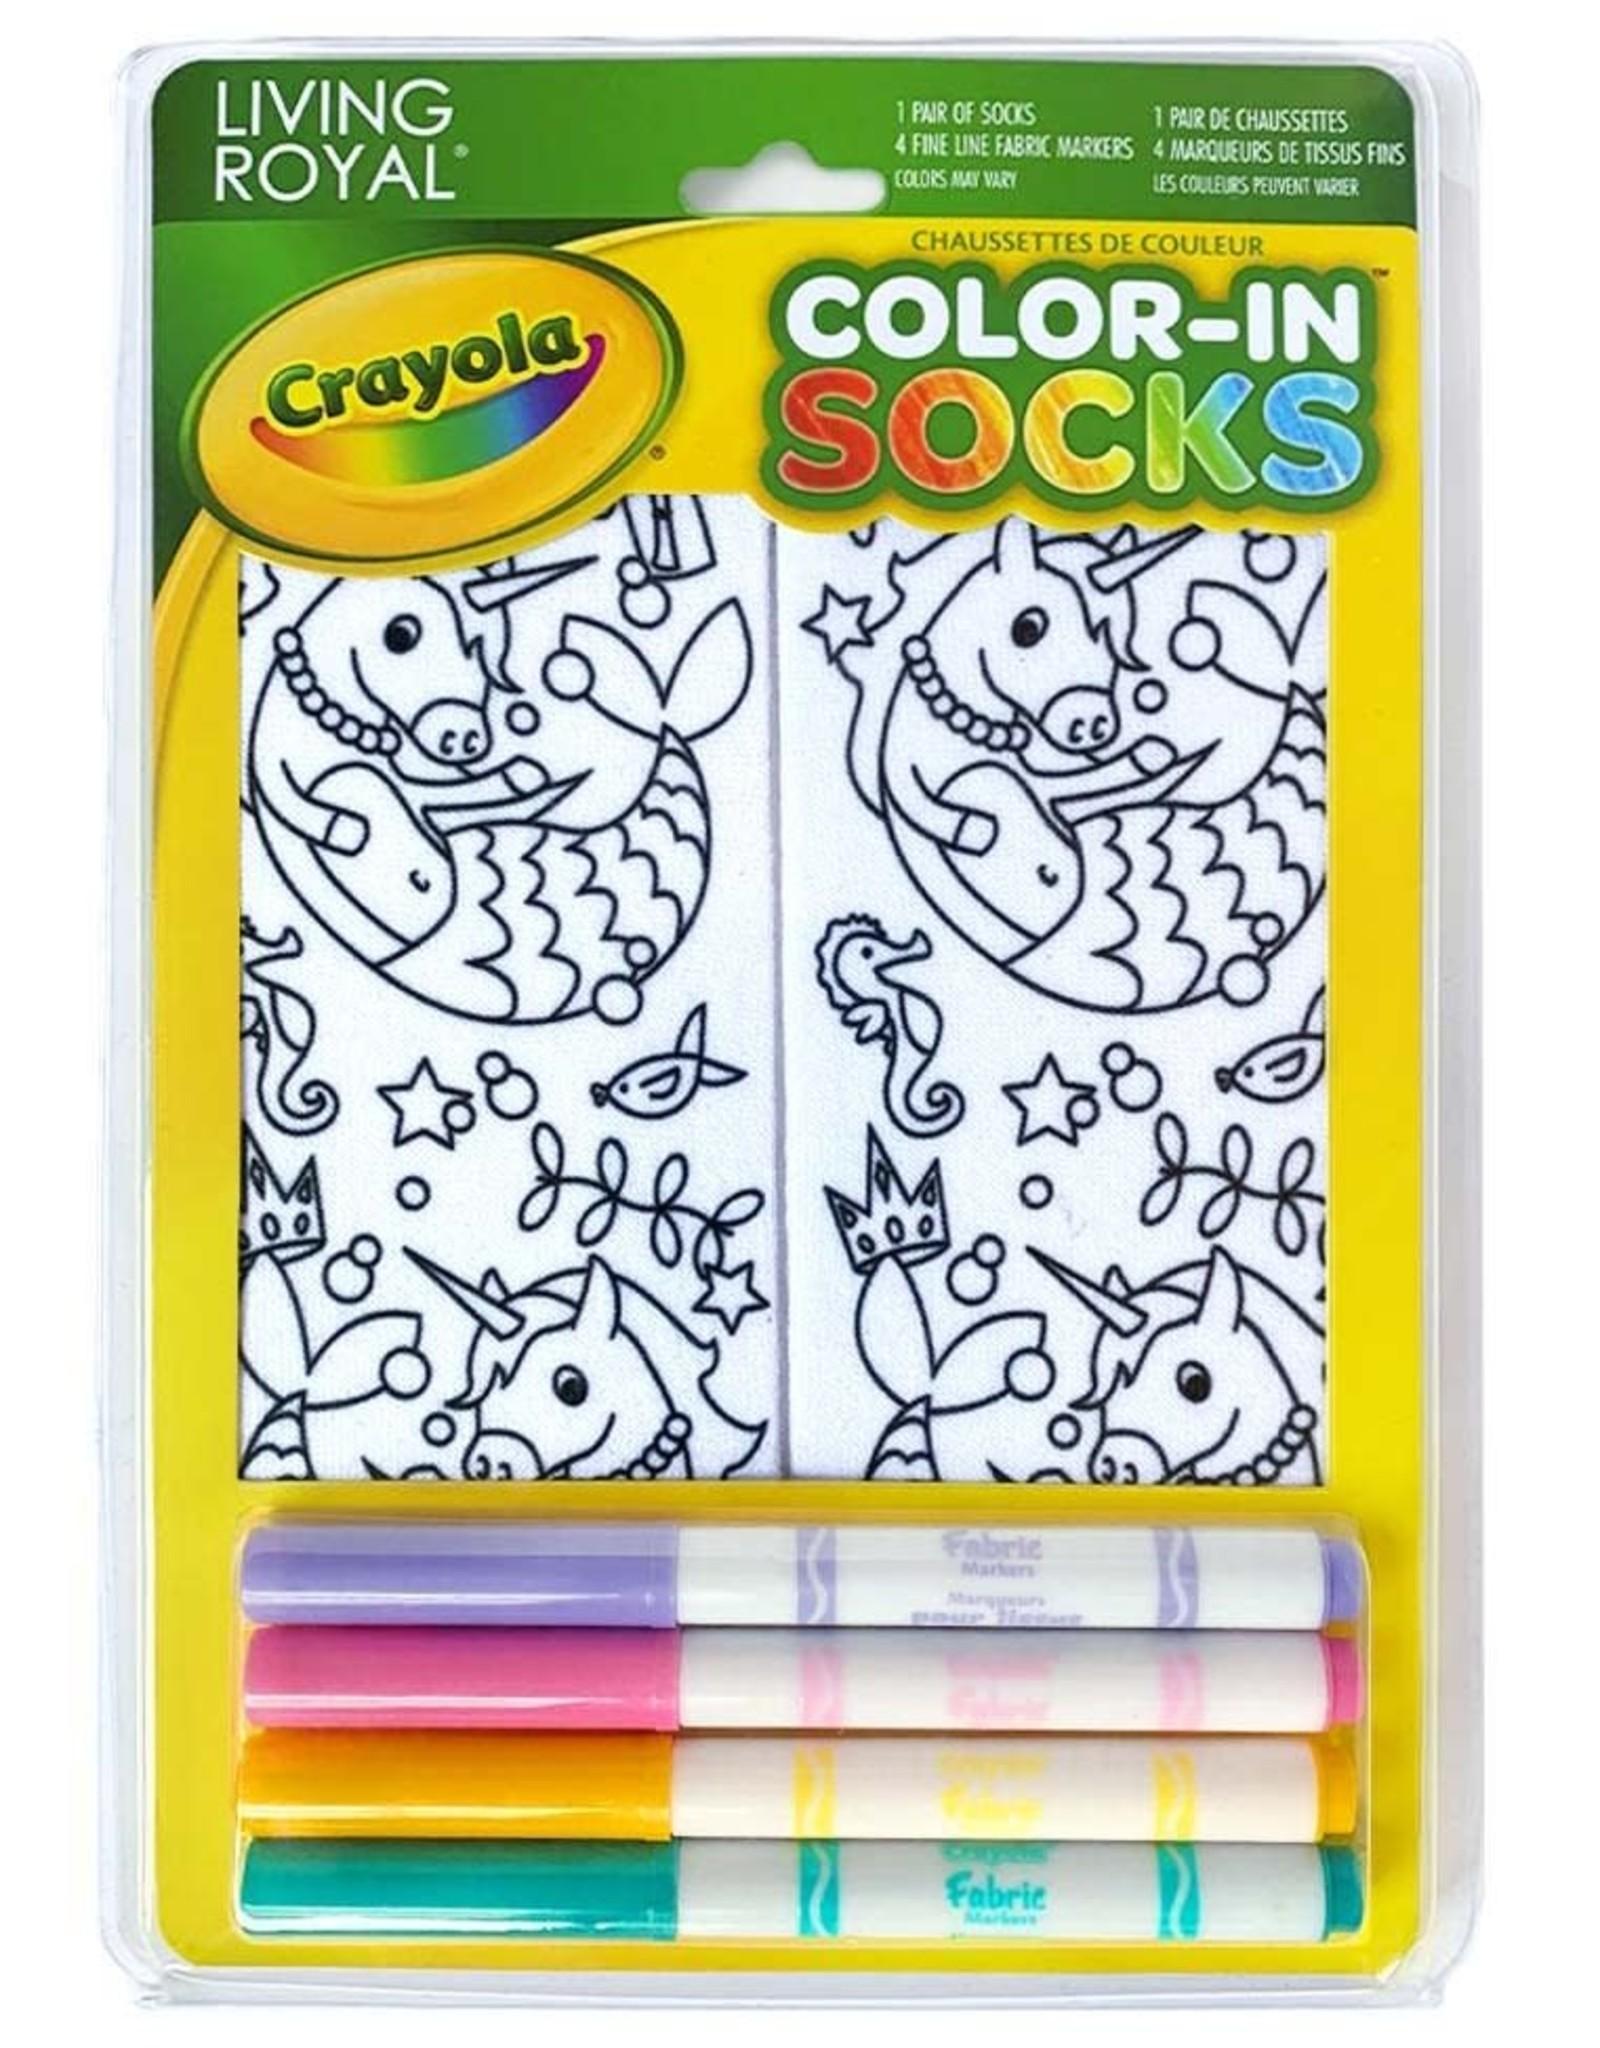 Crayola Color-In Socks: Unicorn Mermaid